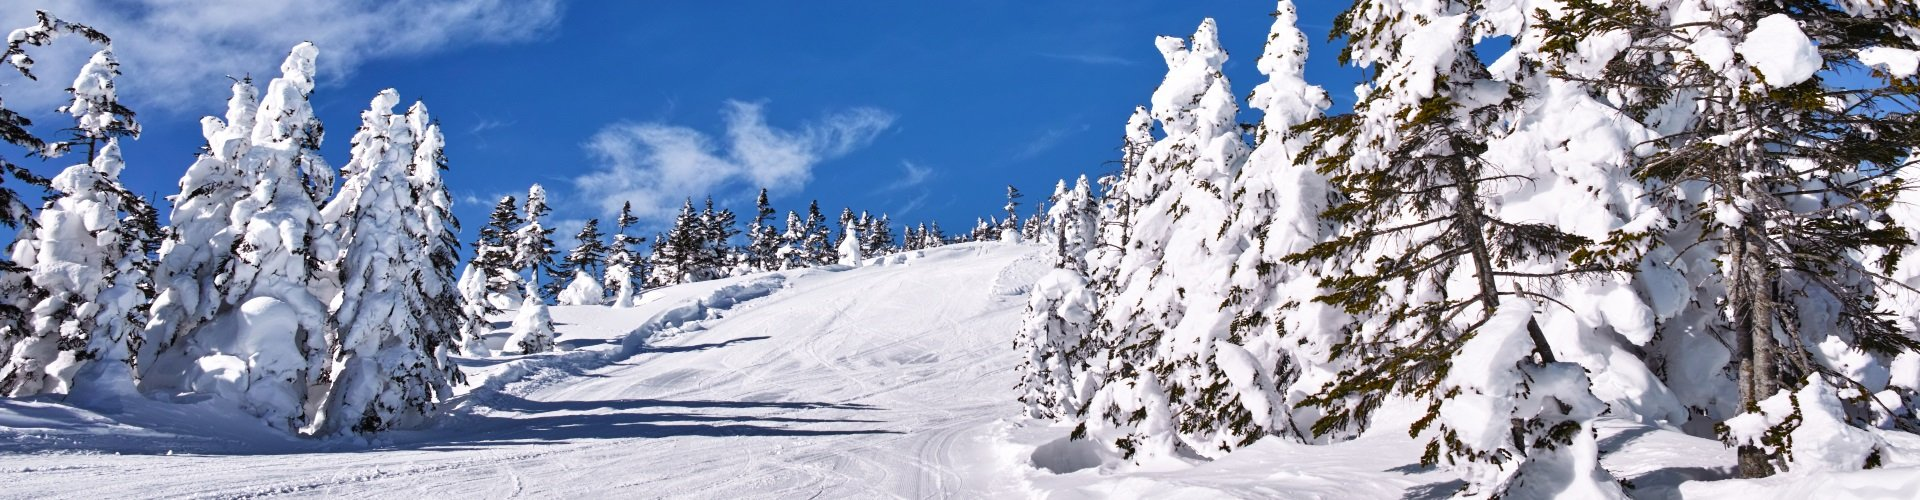 Skigebiet Grafenau